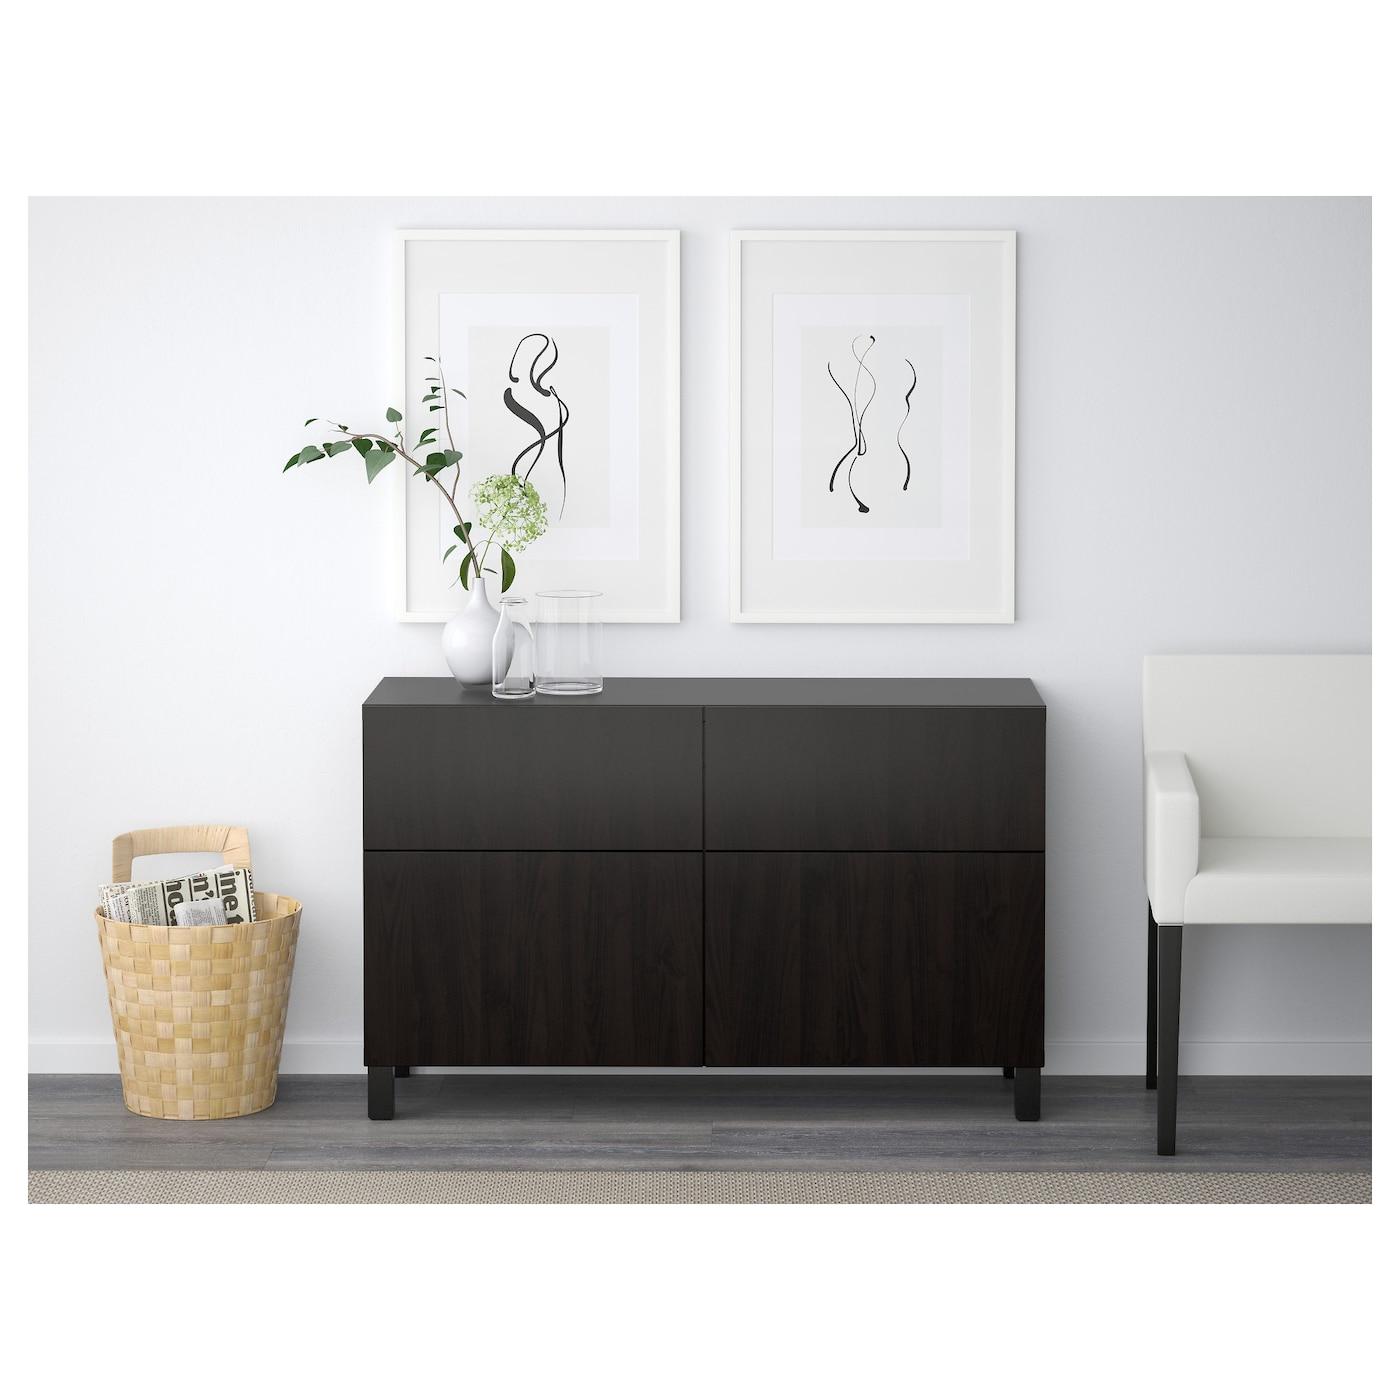 best combi rgt portes tiroirs lappviken brun noir 120x40x74 cm ikea. Black Bedroom Furniture Sets. Home Design Ideas